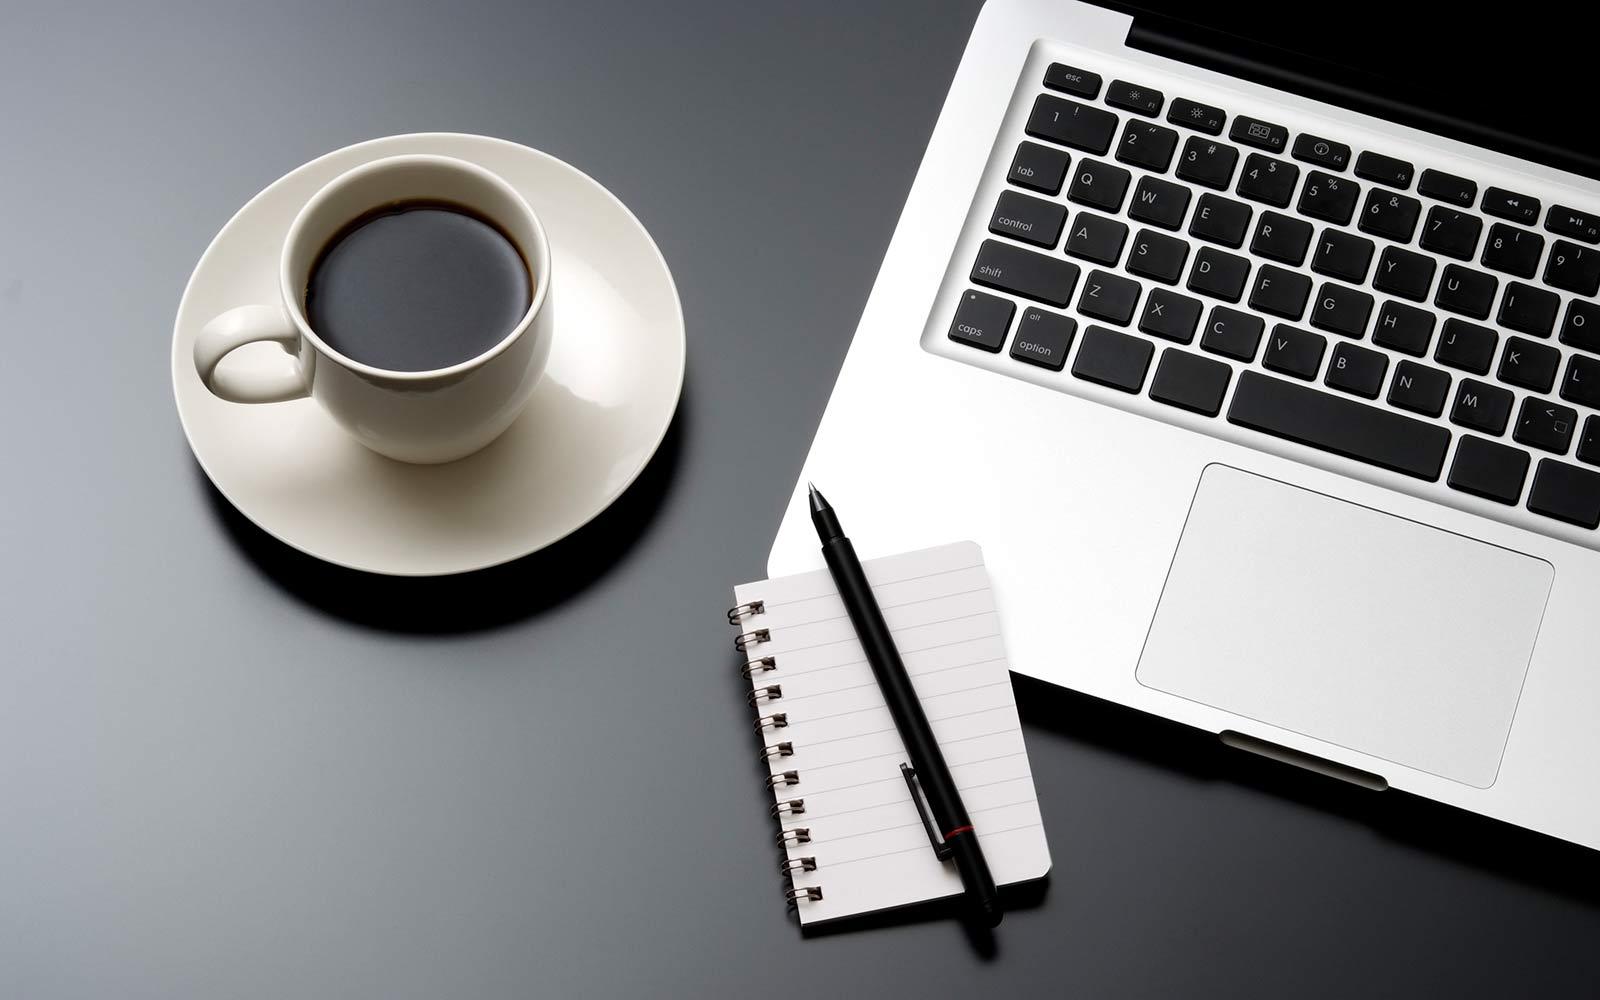 laptop computer and coffee mug